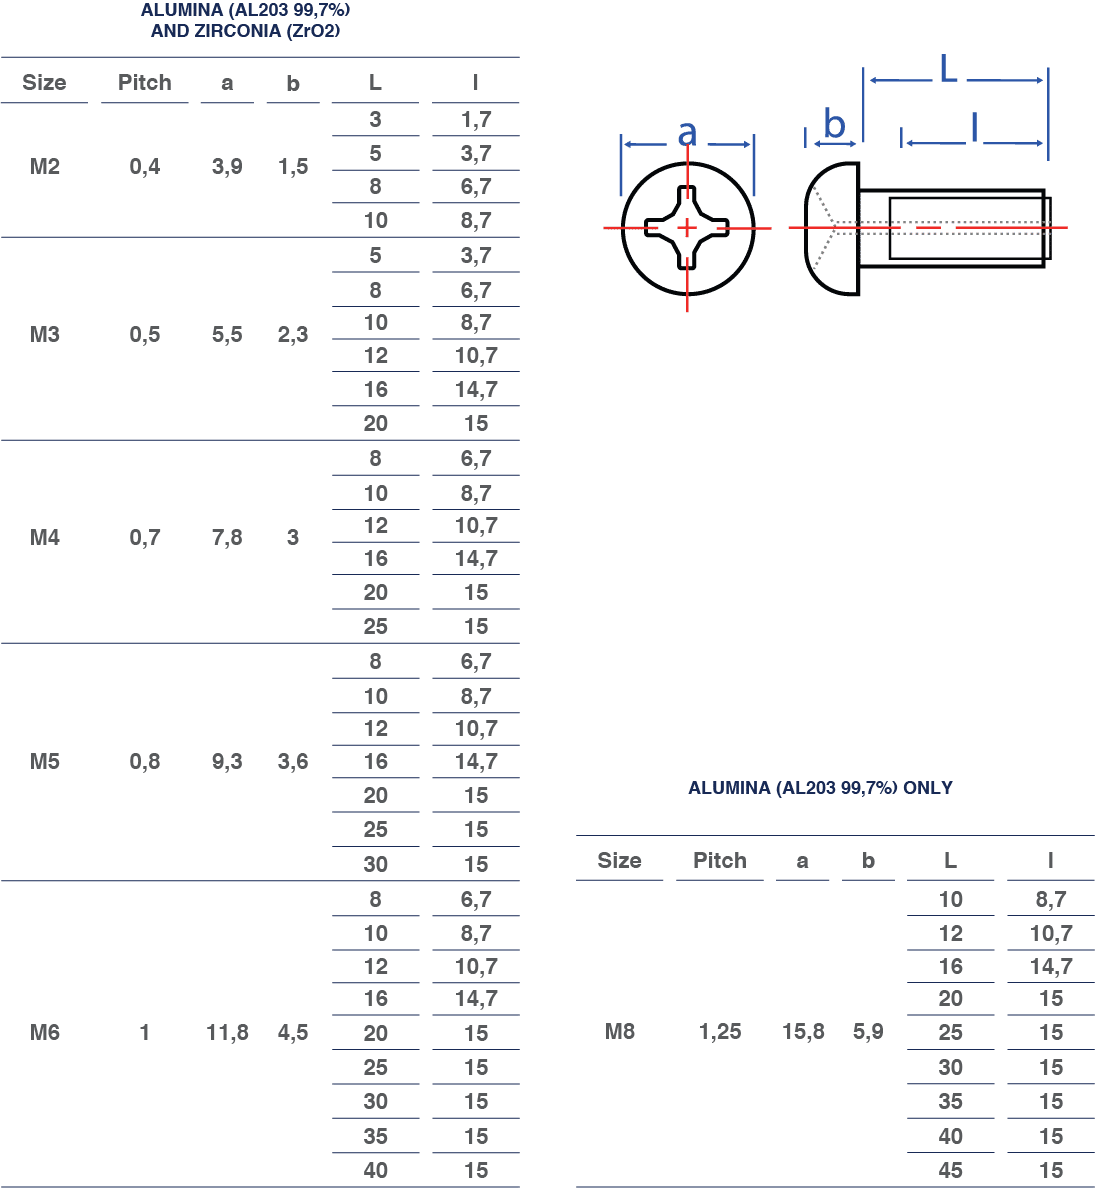 pan head gas hole screws dimensions